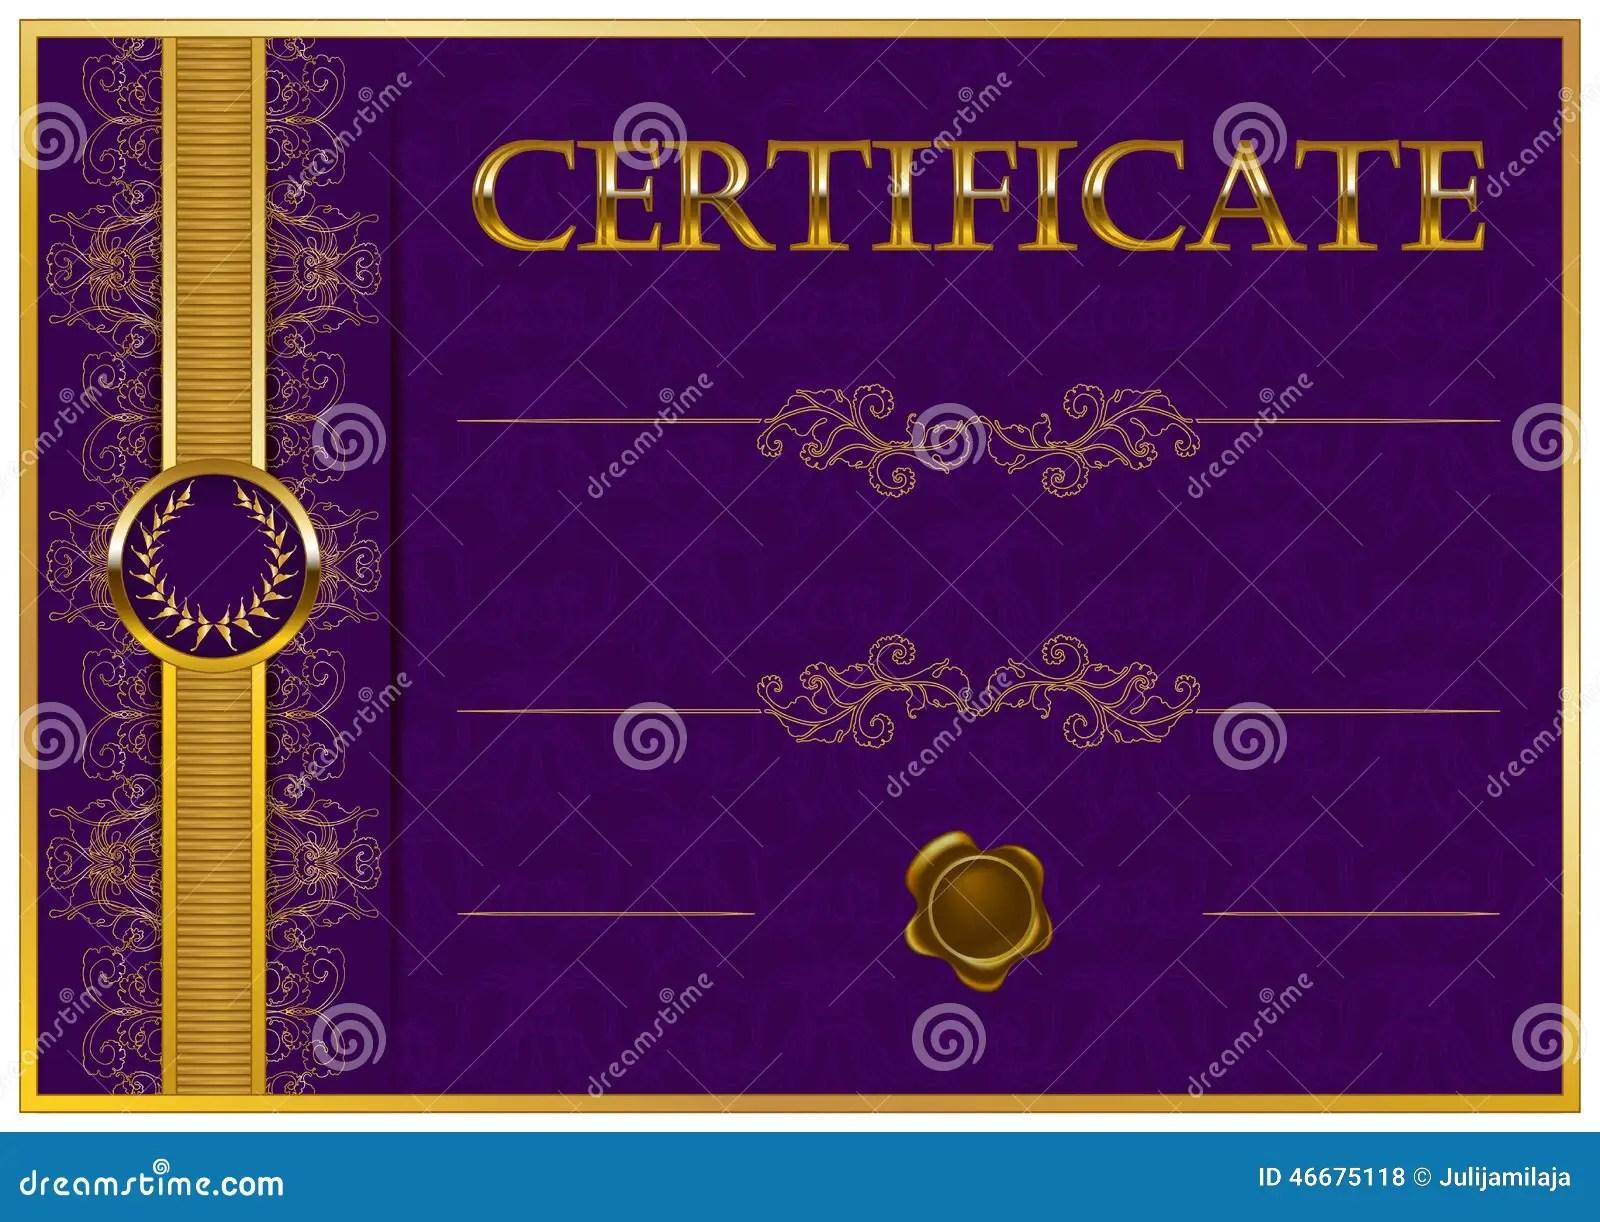 5 8 Graduation 11 X Purple Border